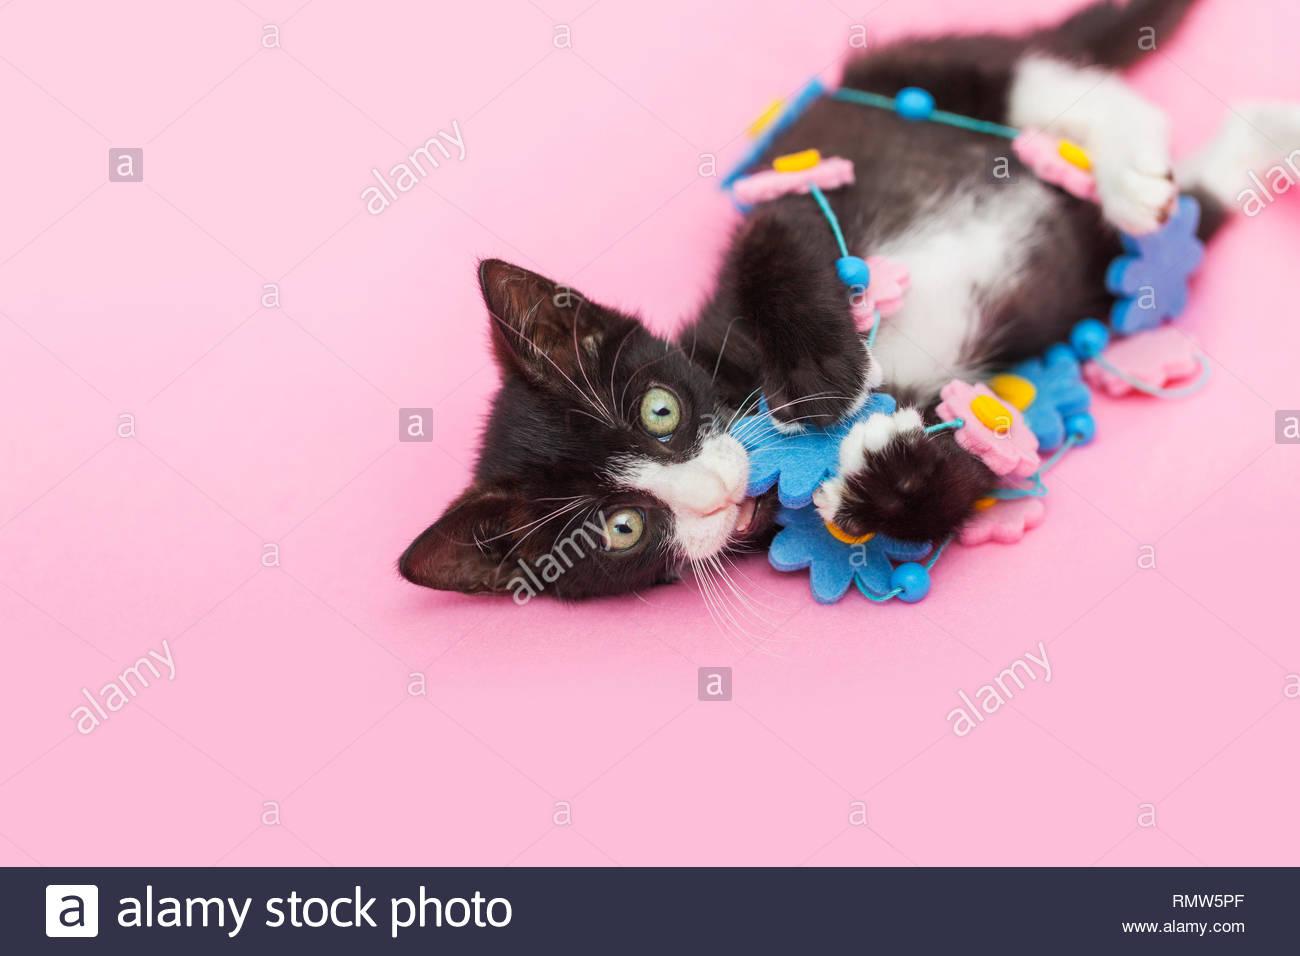 Tuxedo Kitten playing with Flower Garland, pink background. - Stock Image